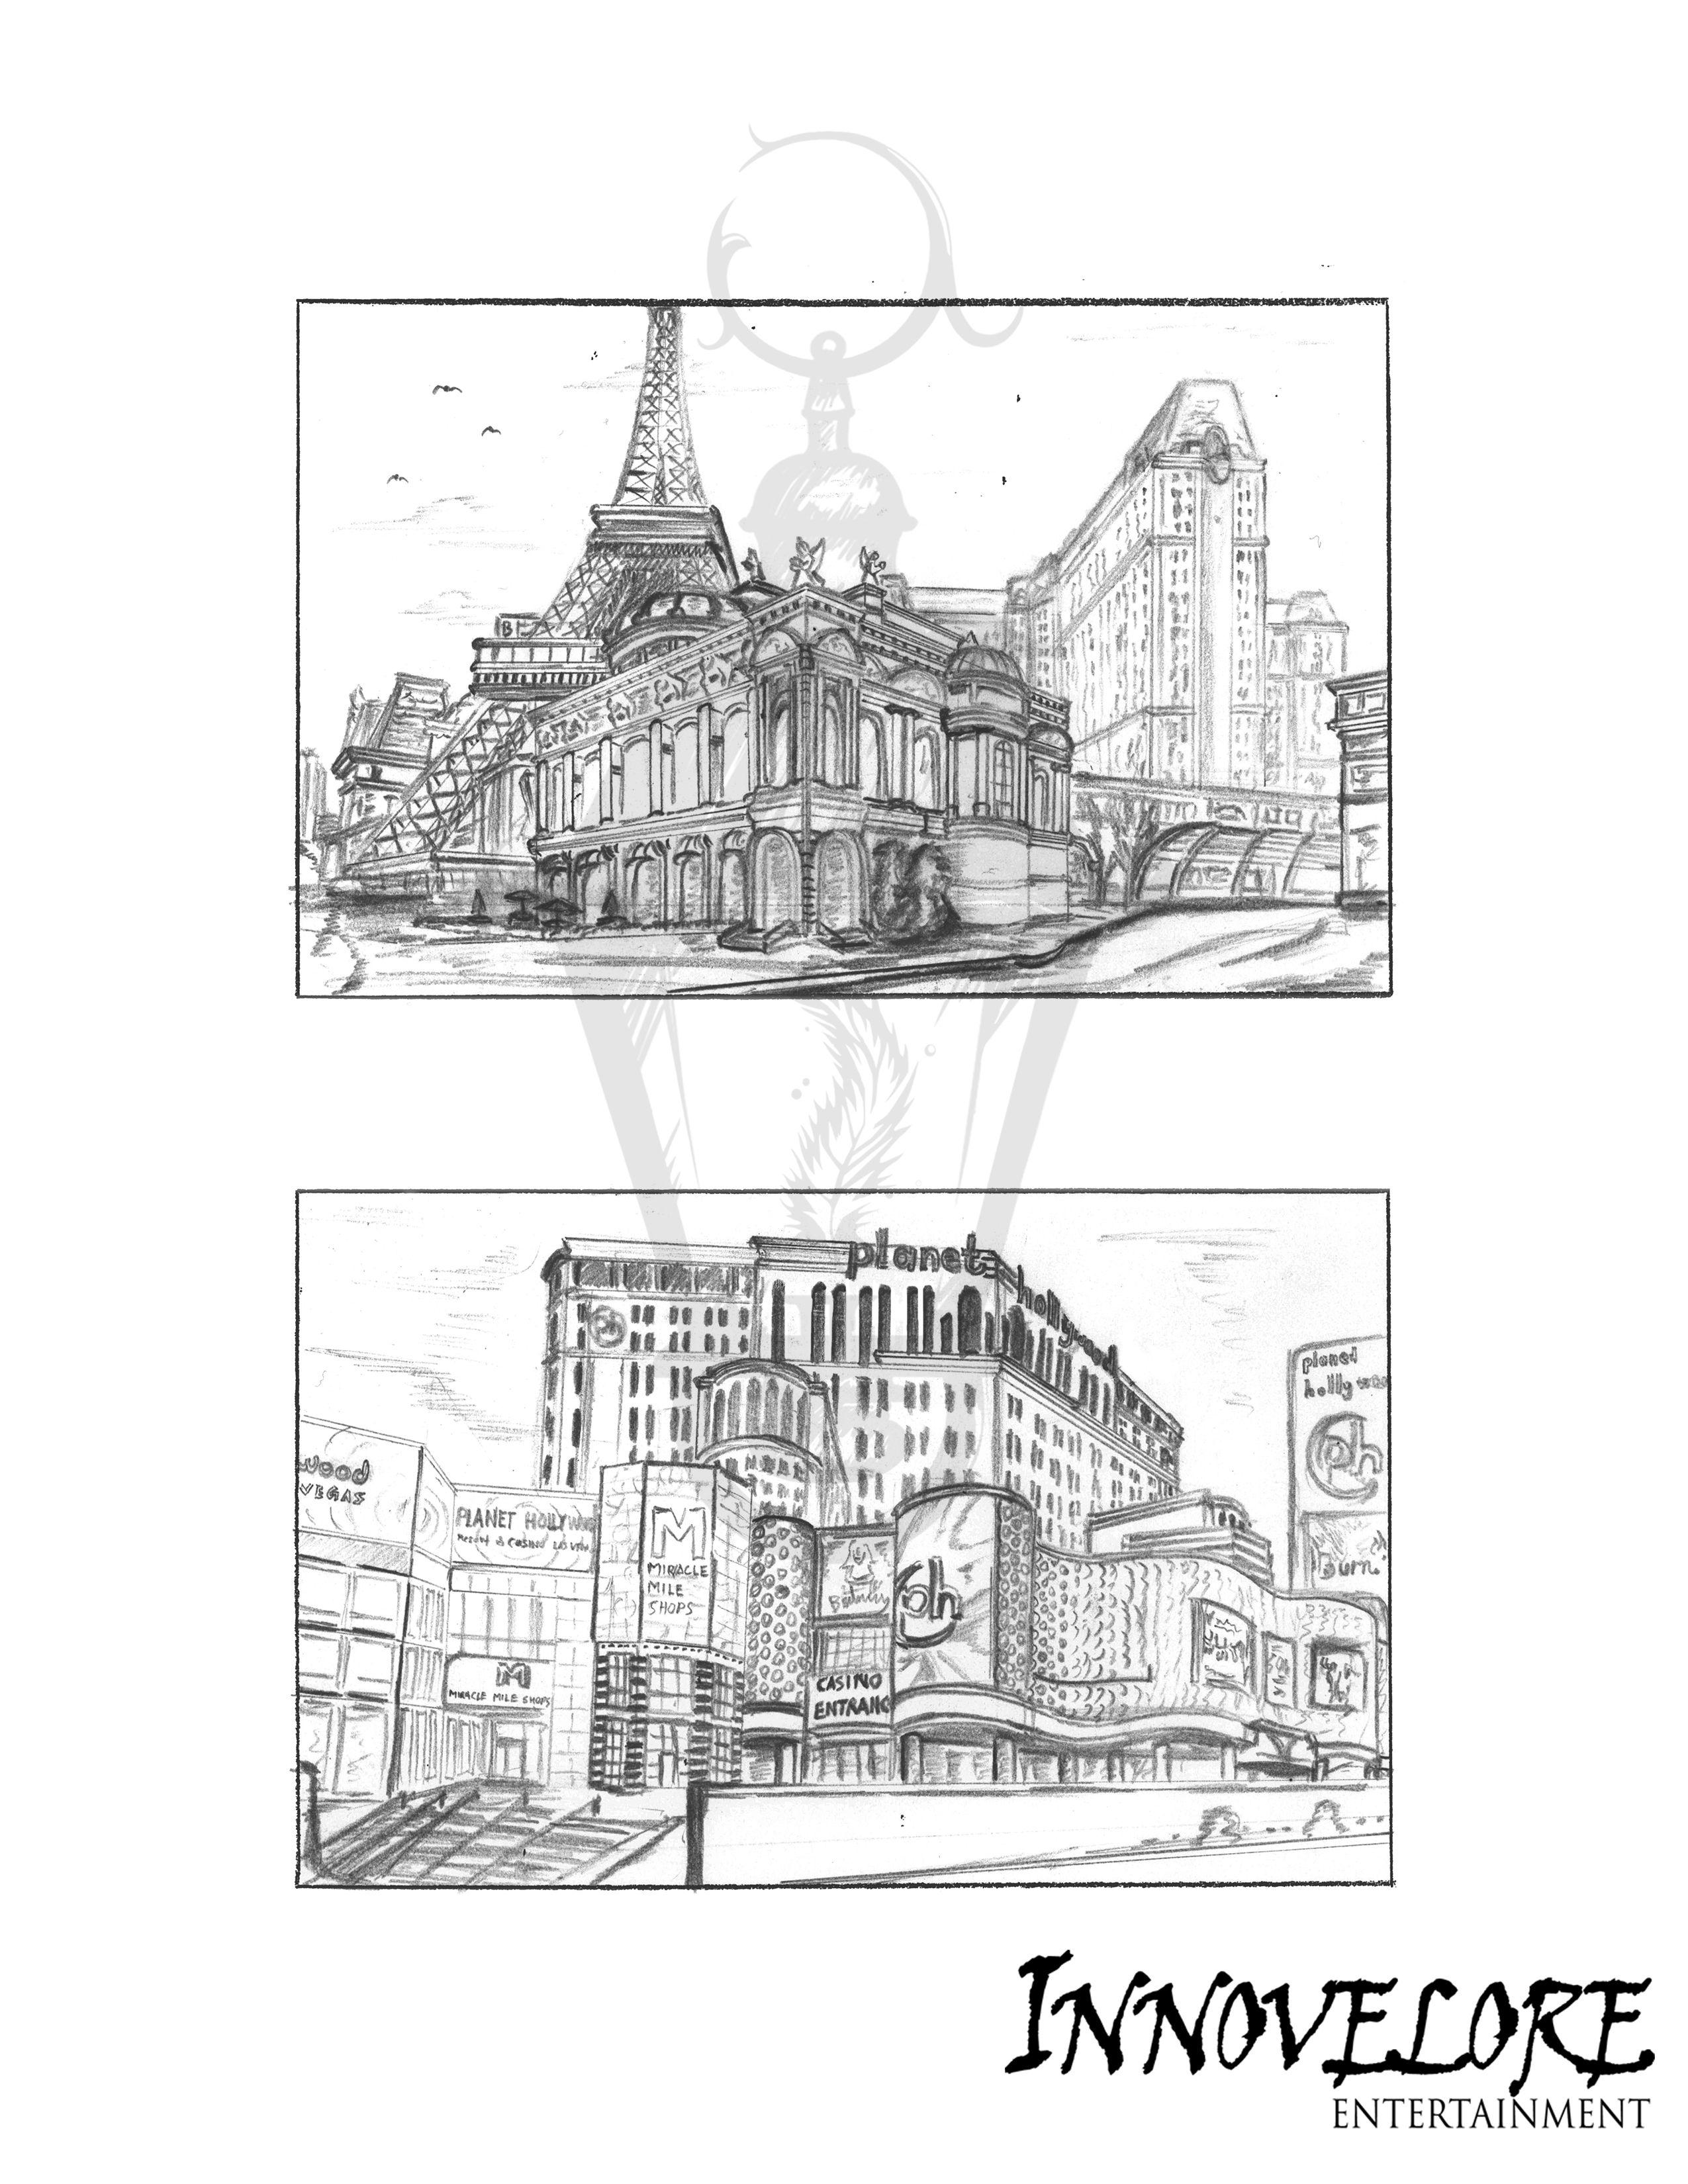 2550x3300 A Landscape Sketch Of A Part Of Las Vegas. The Illustration Was